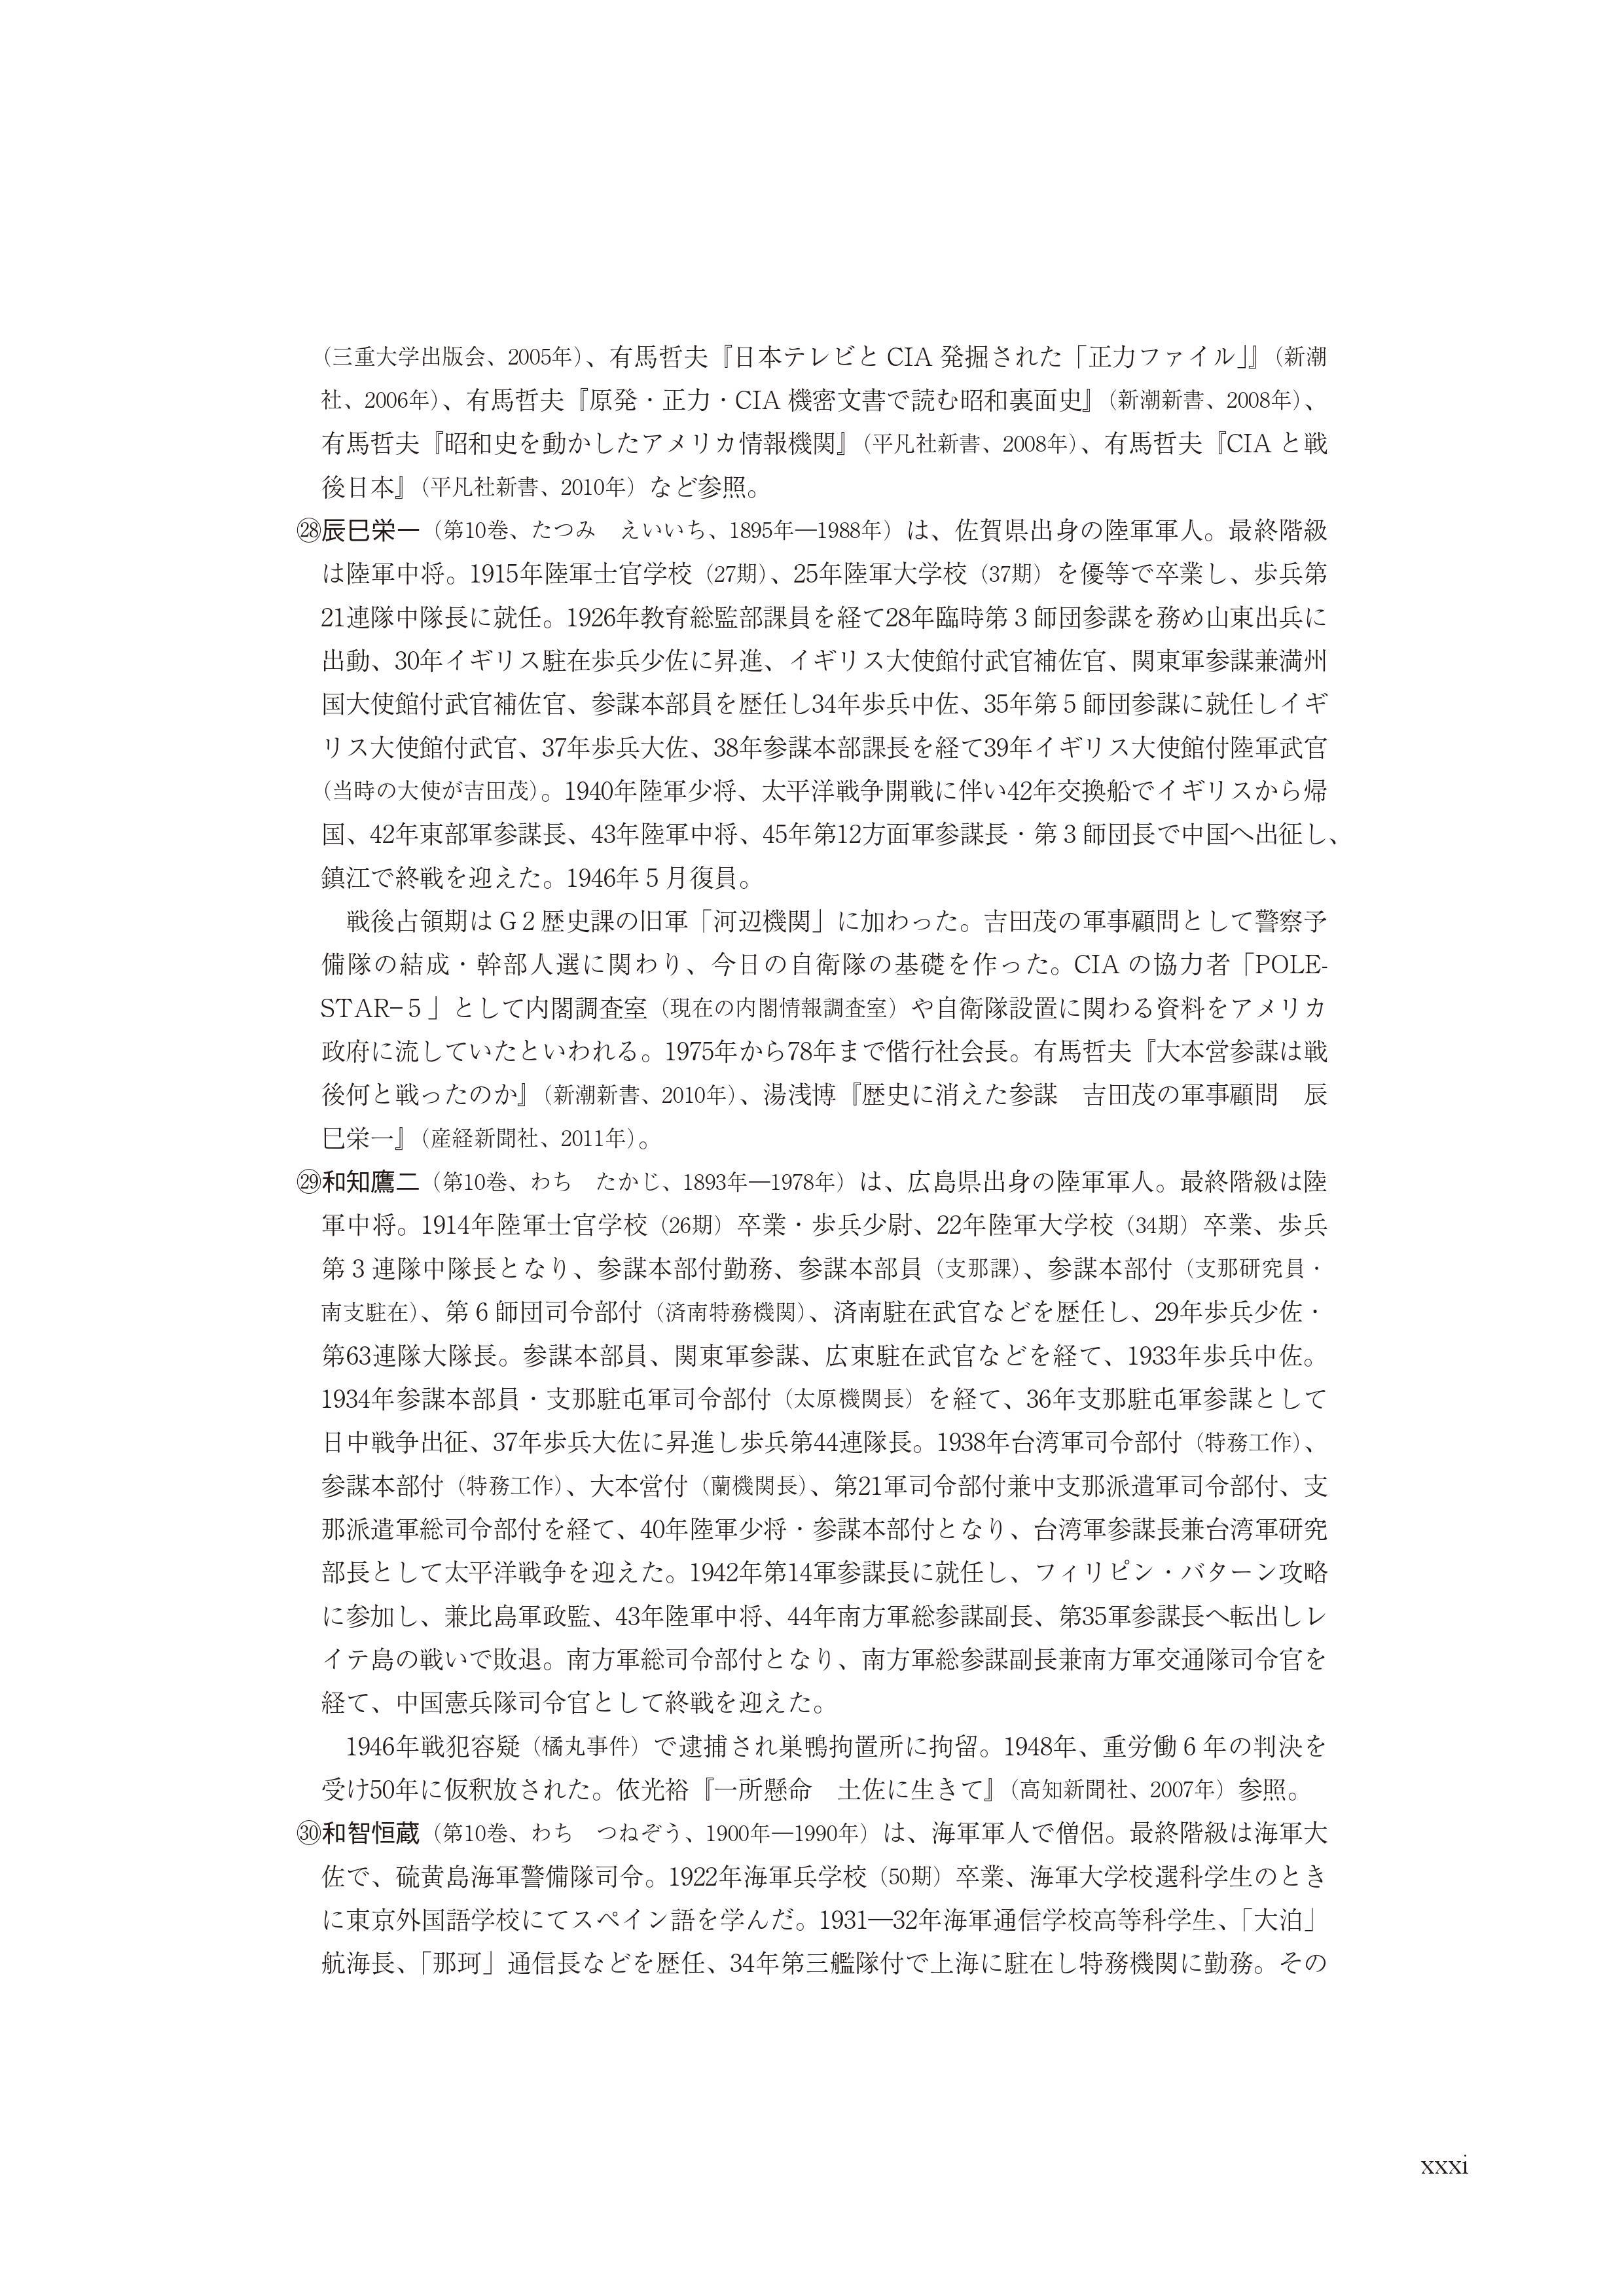 CIA日本人ファイル0001 (31)